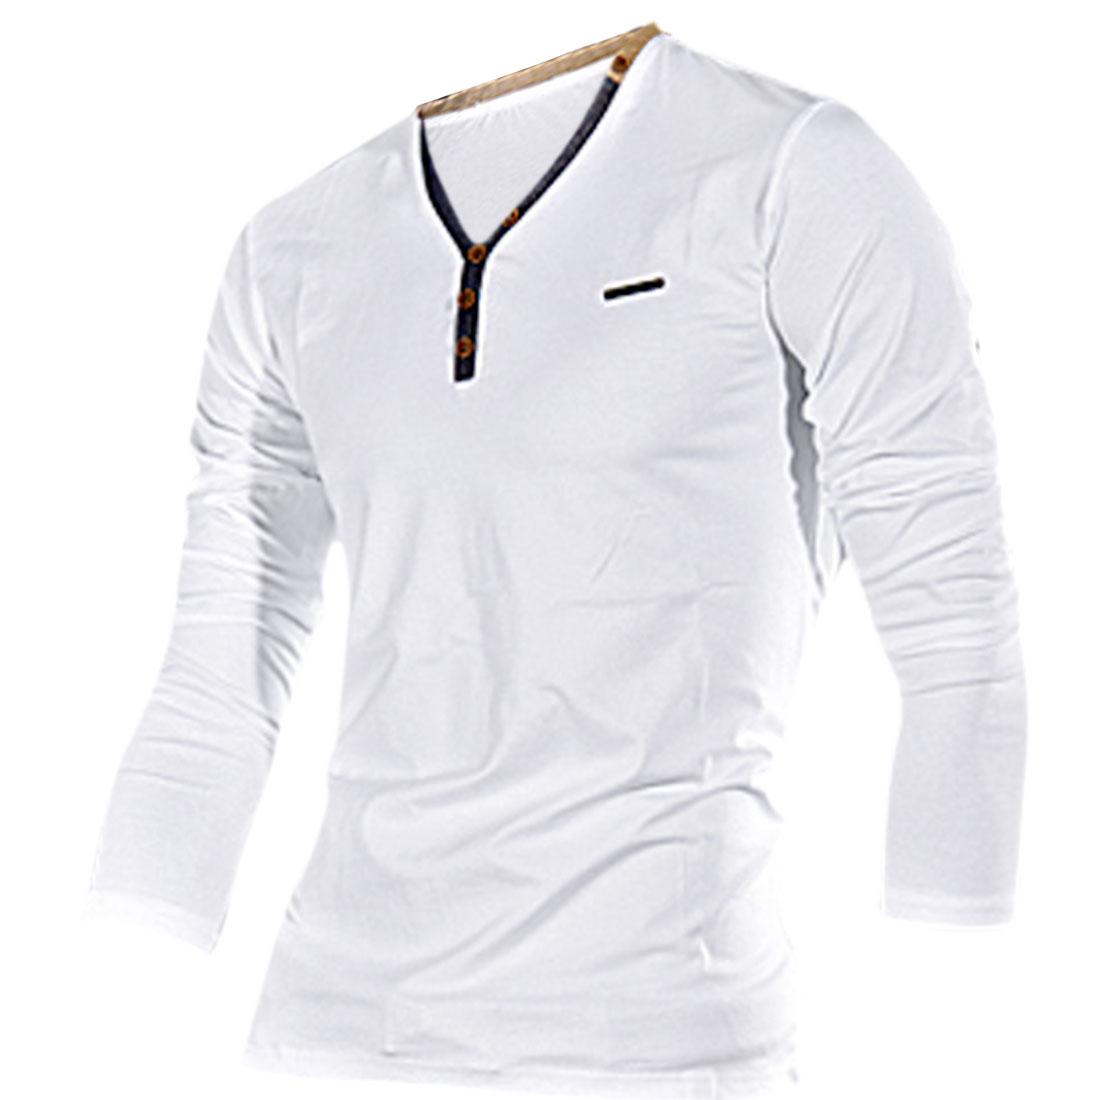 White Color Buttons Decor Front Slim Fit T-Shirt for Man S